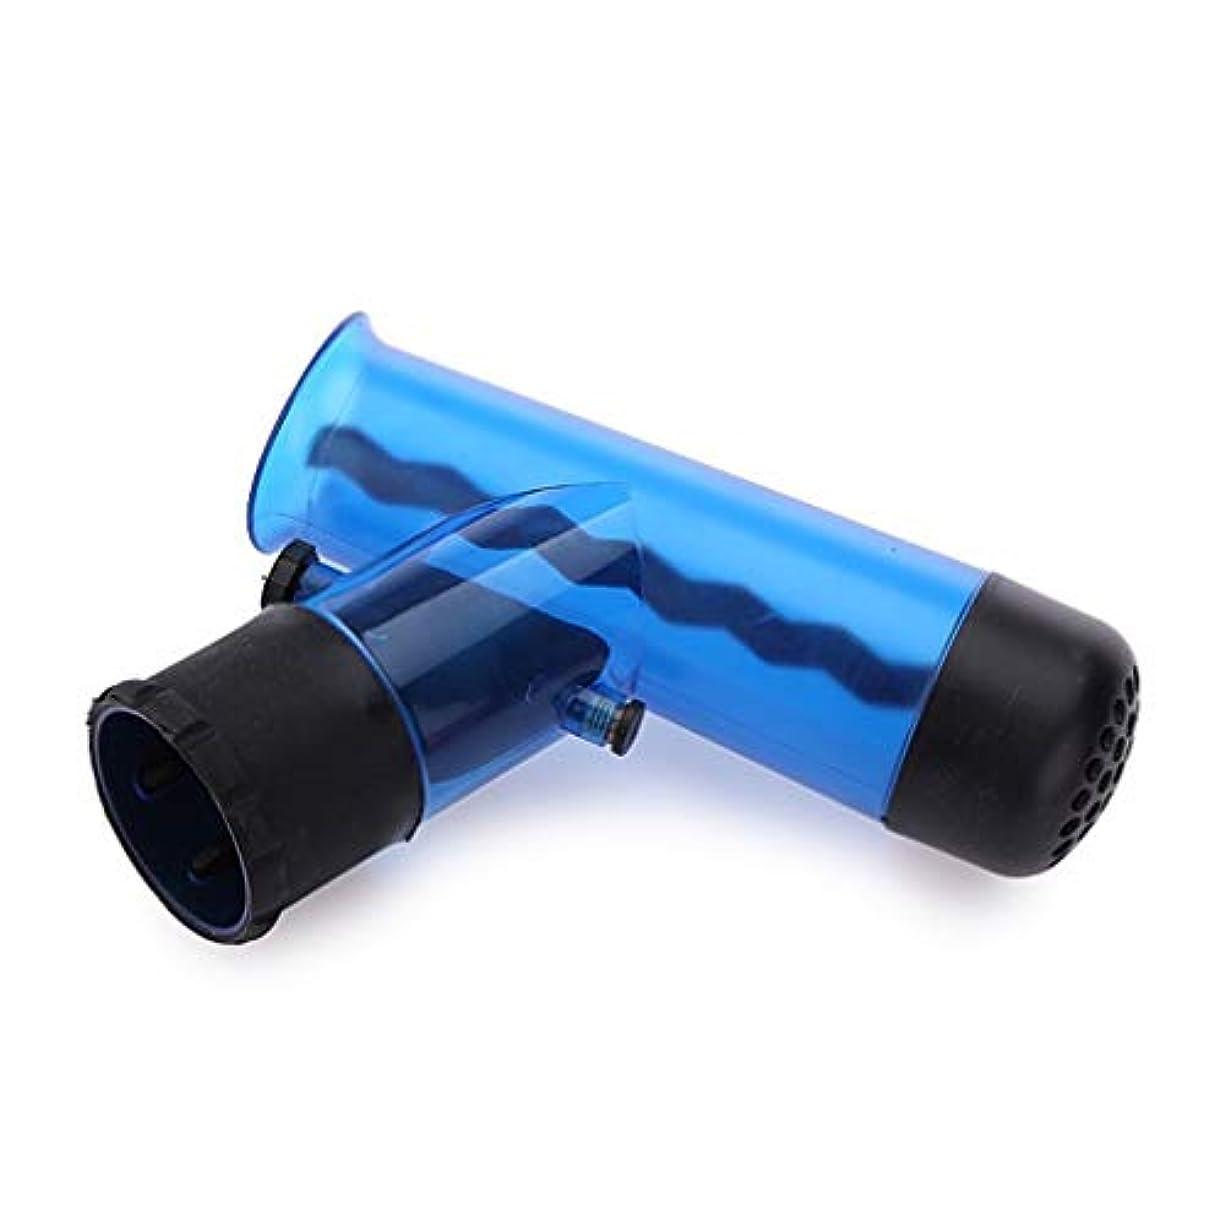 Yulili ポータブルサイズヘアドライヤーディフューザーマジック風回転取り外し可能なドライブローヘアディフューザーローラーカーラー女性ヘアスタイリングツール (Color : Blue)